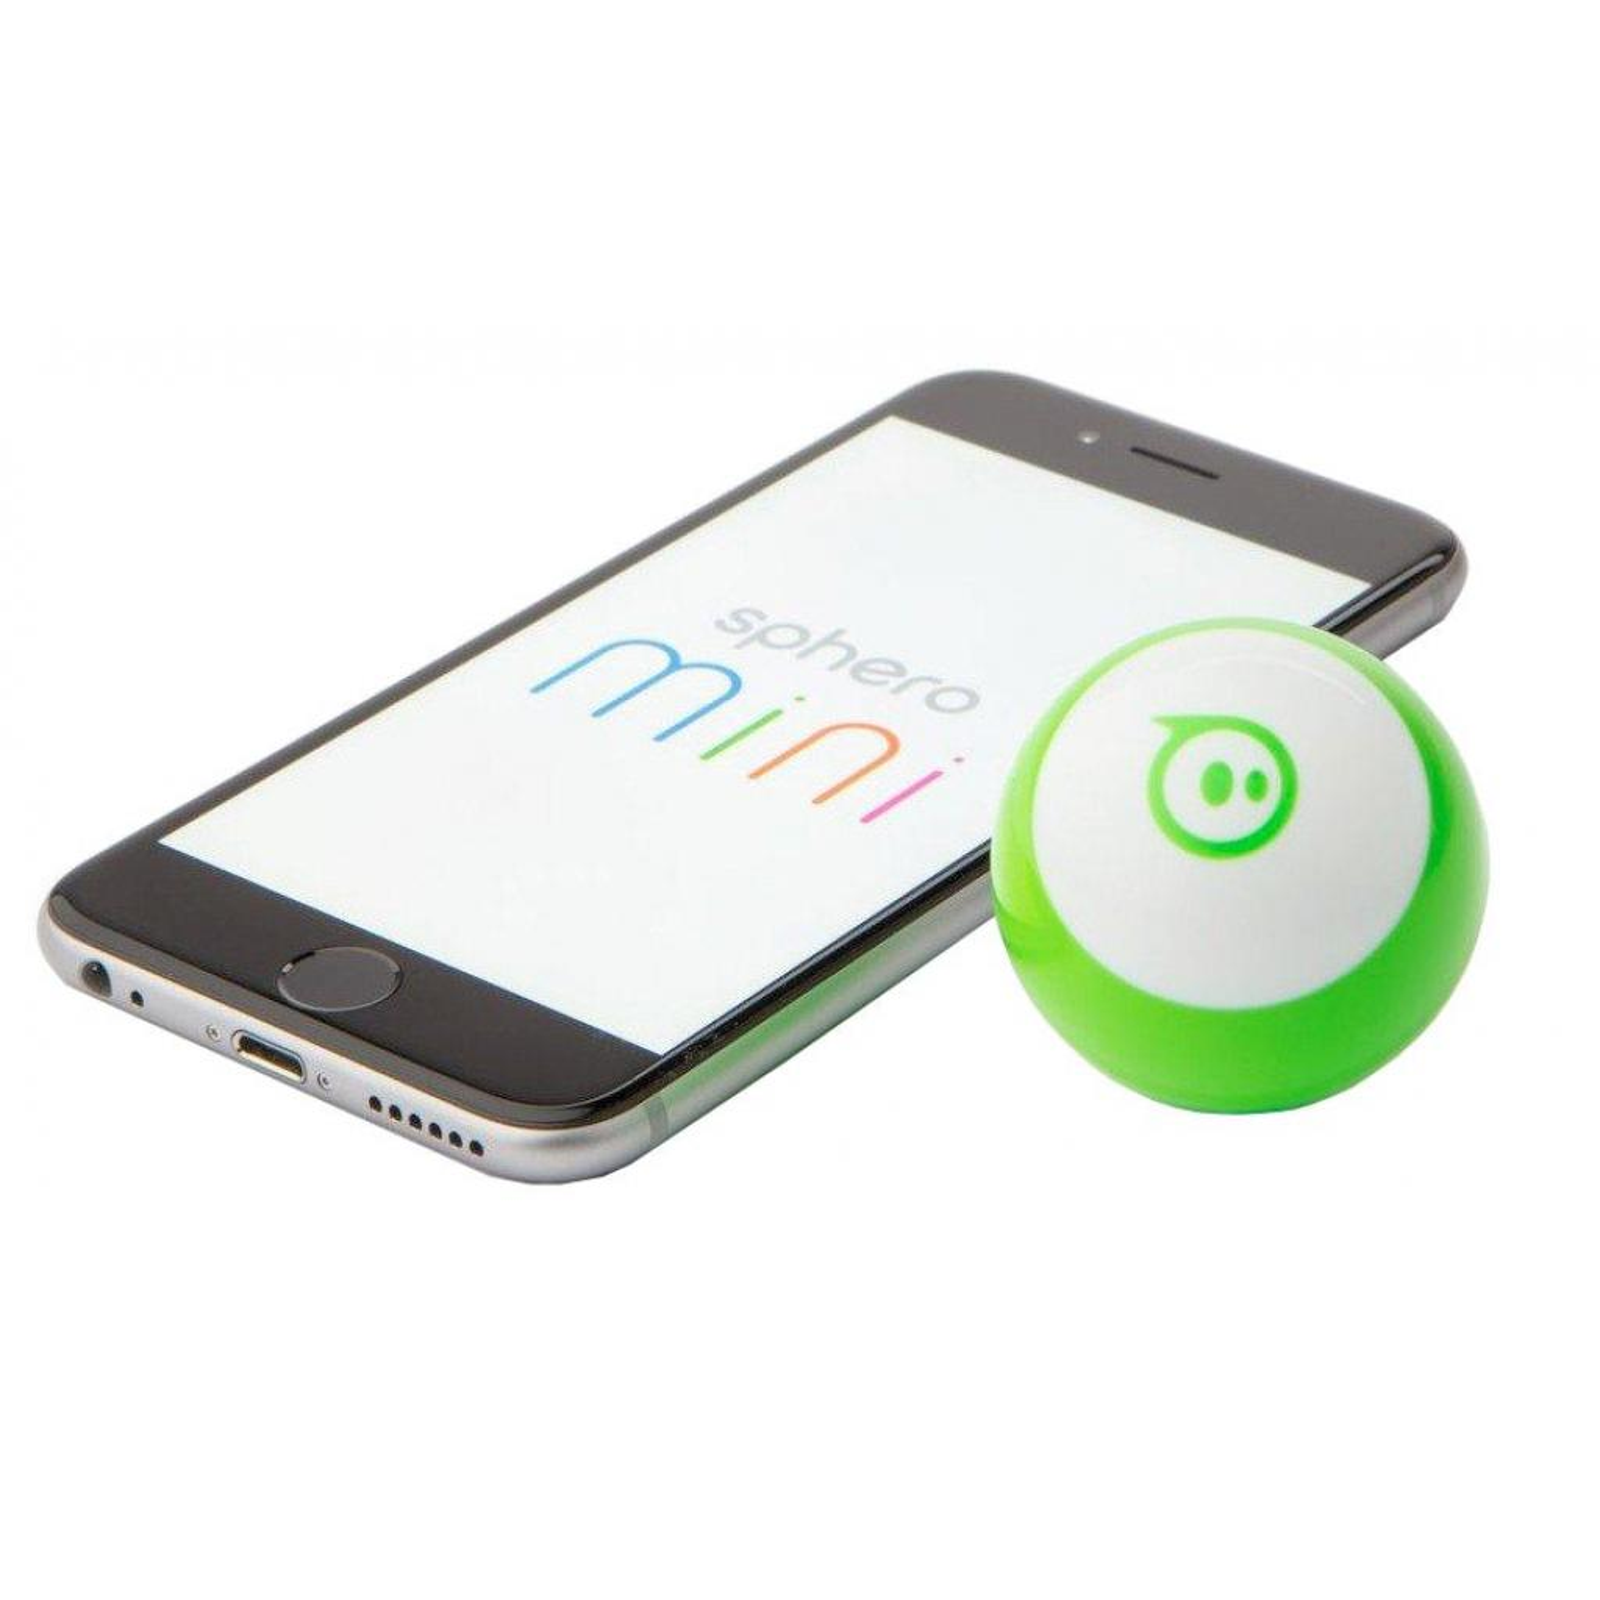 Робот Sphero Mini Green (322660) изображение 2